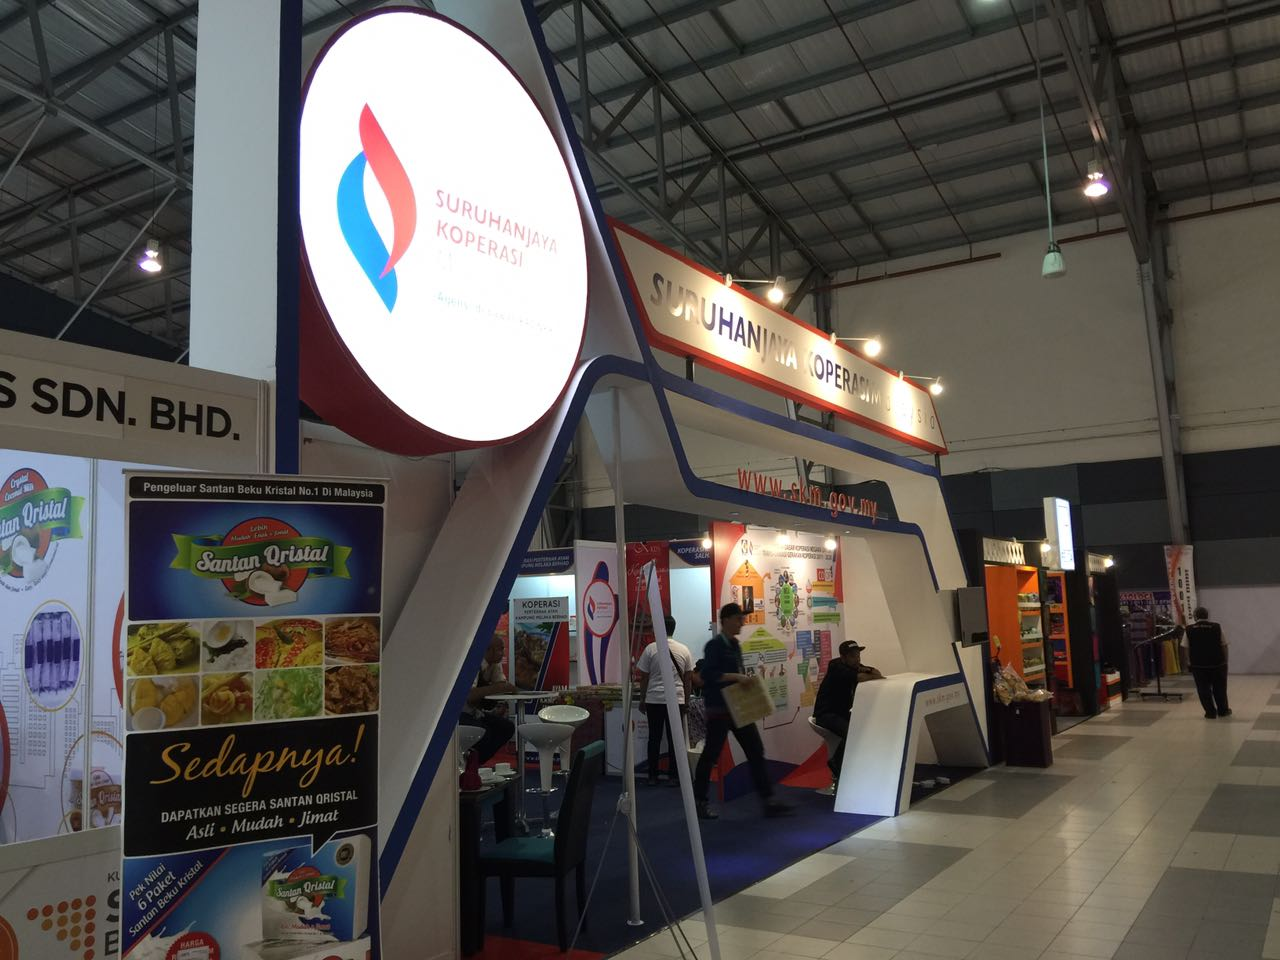 Booth Suruhanjaya Komunikasi Malaysia, Event Satu Daerah Satu Industri, Melaka